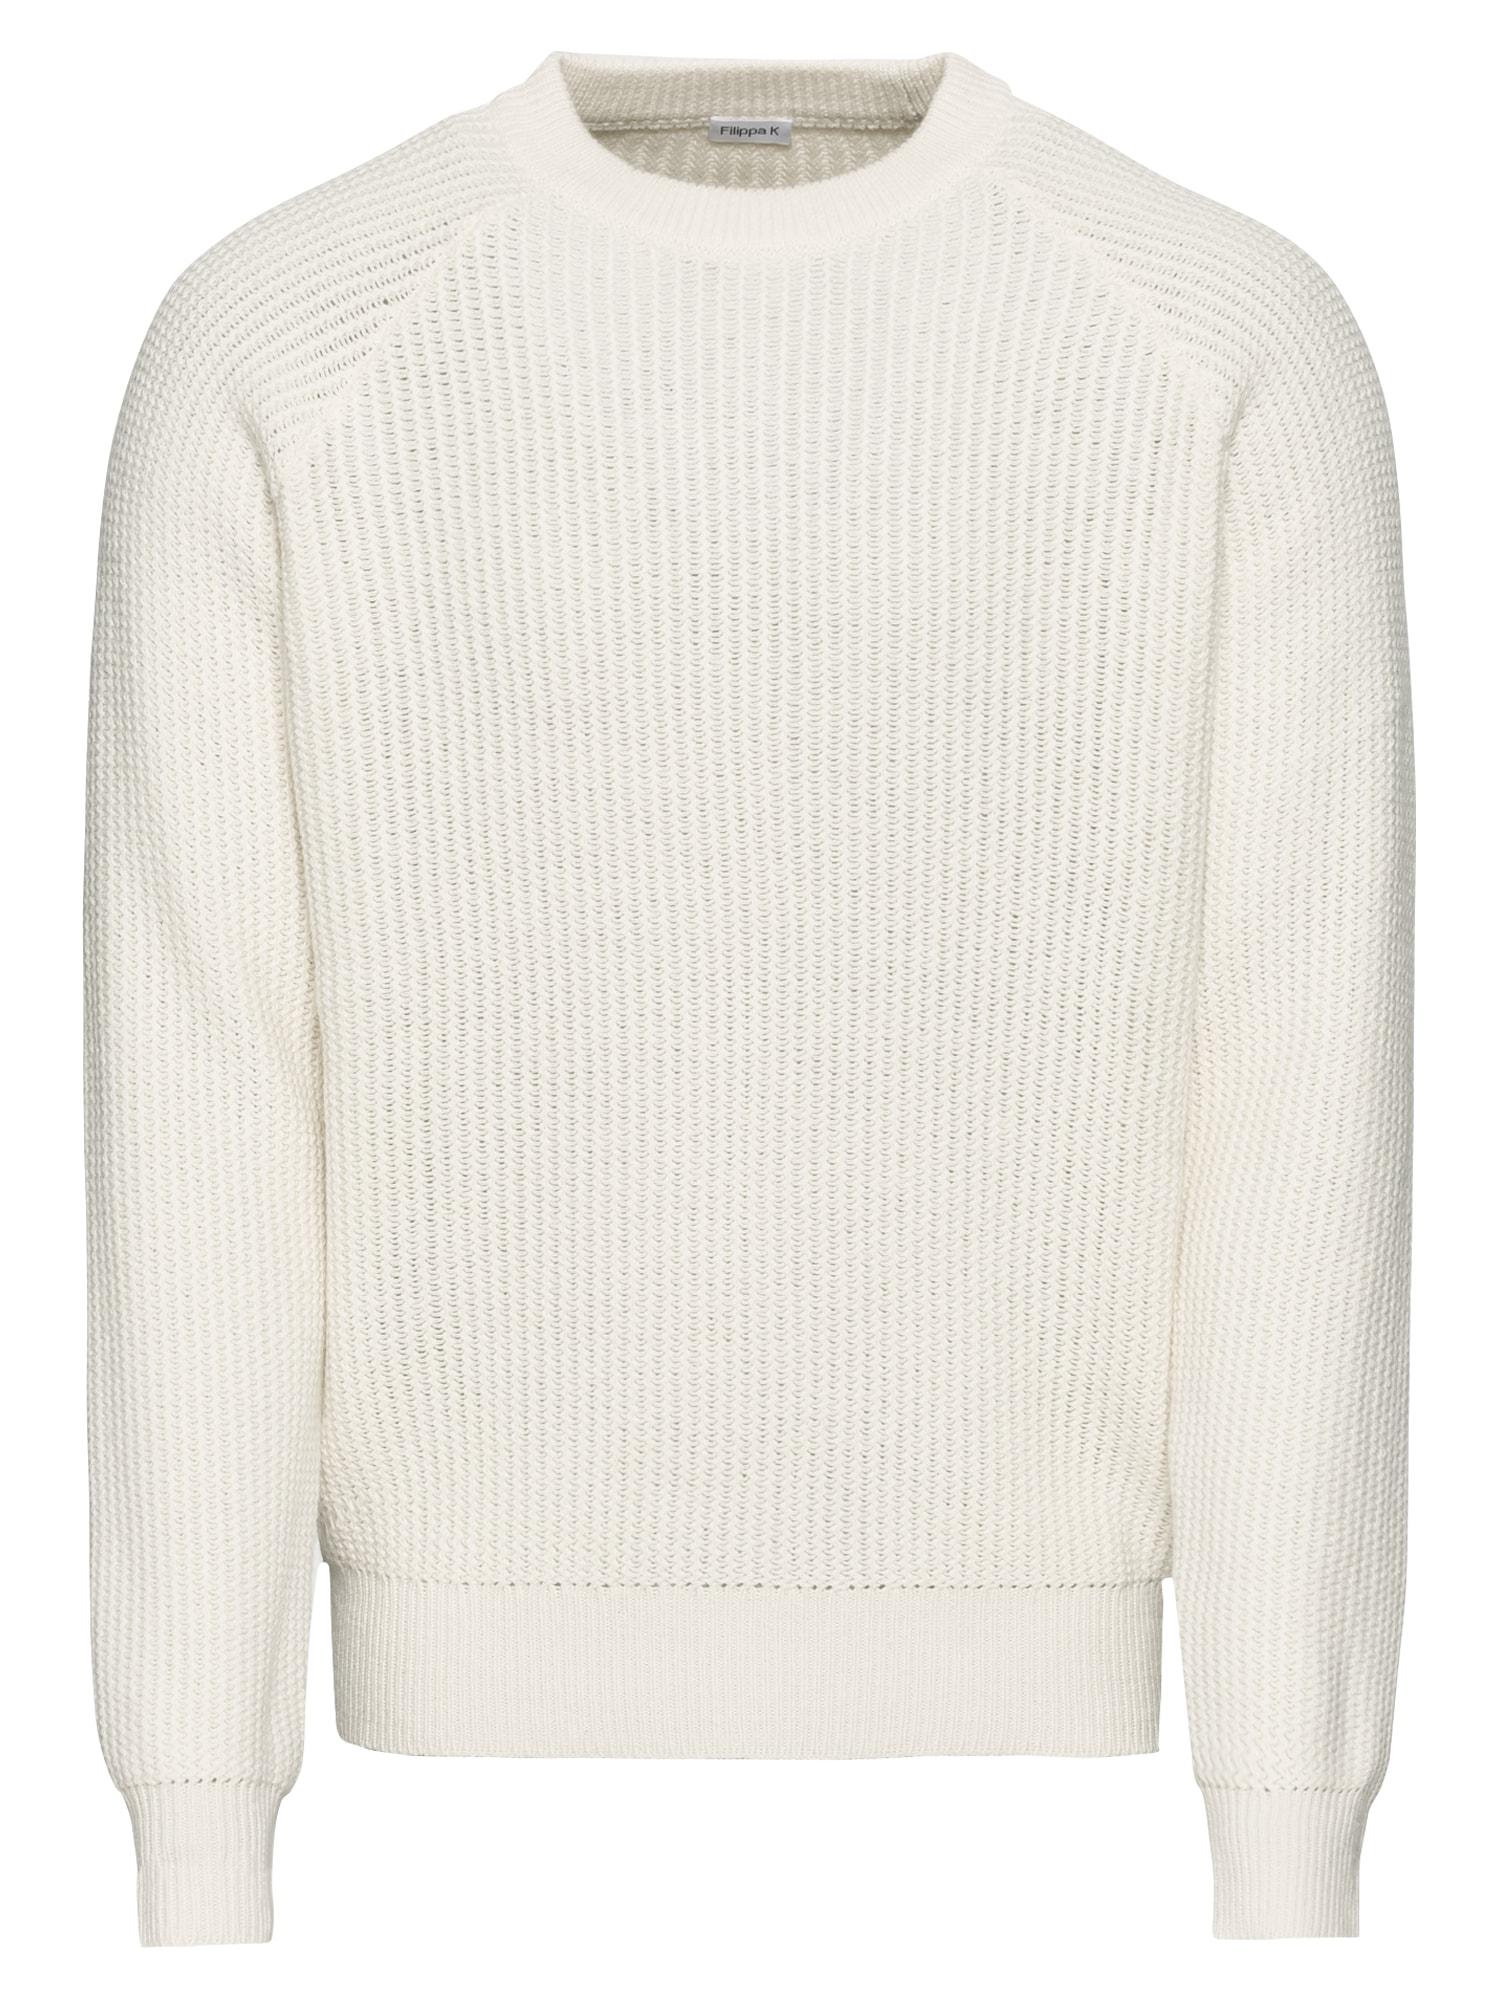 Svetr M. Wave Stitch Sweater offwhite Filippa K